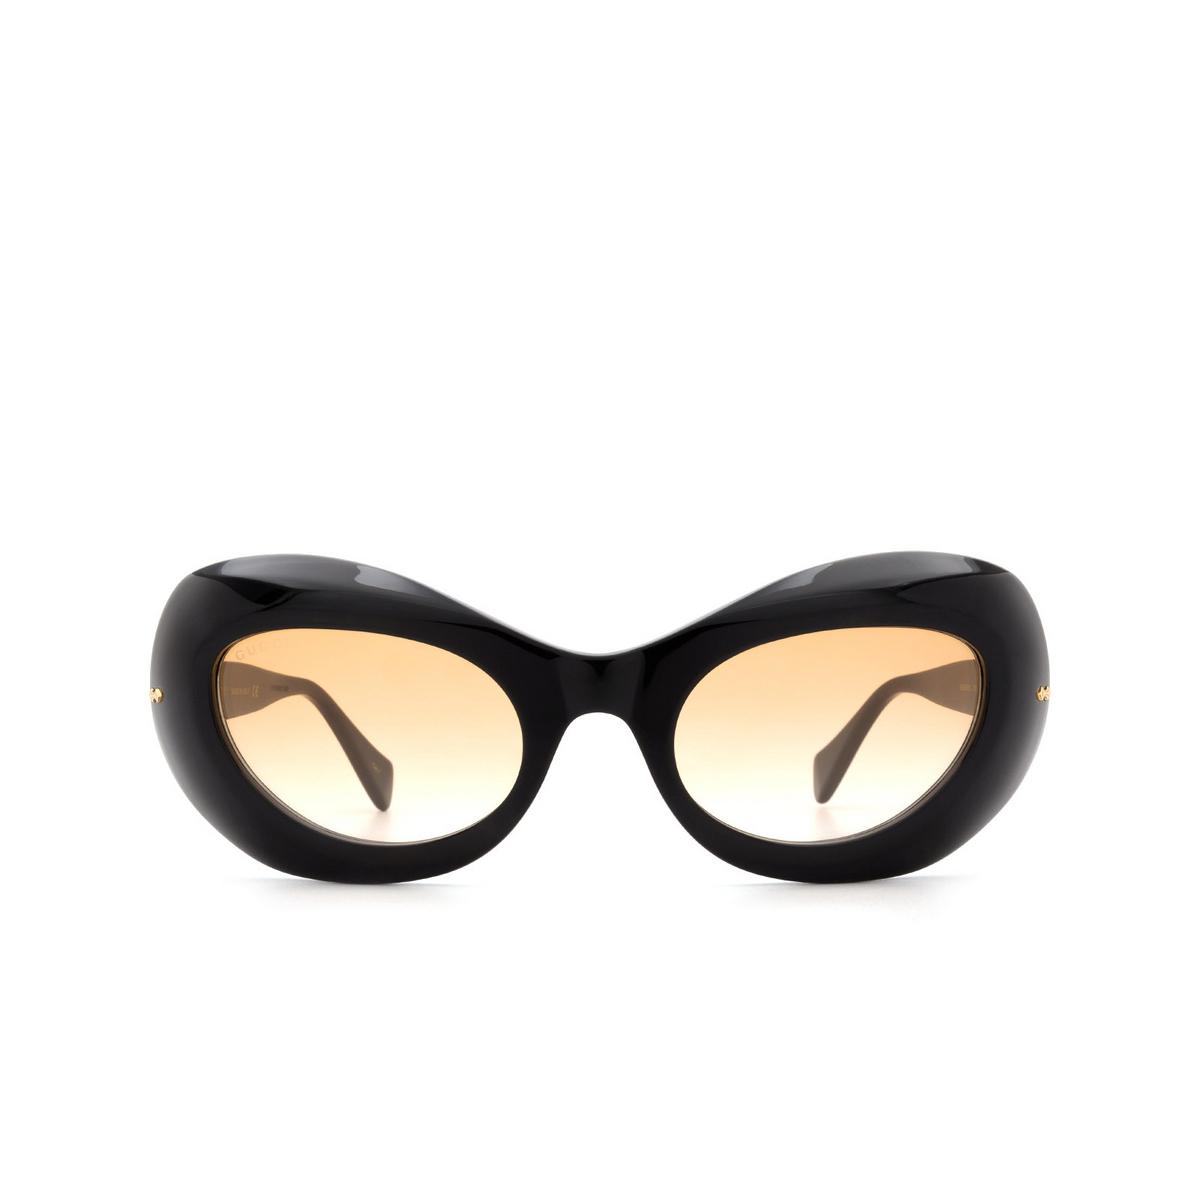 Gucci® Oval Sunglasses: GG0990S color Black 003 - front view.